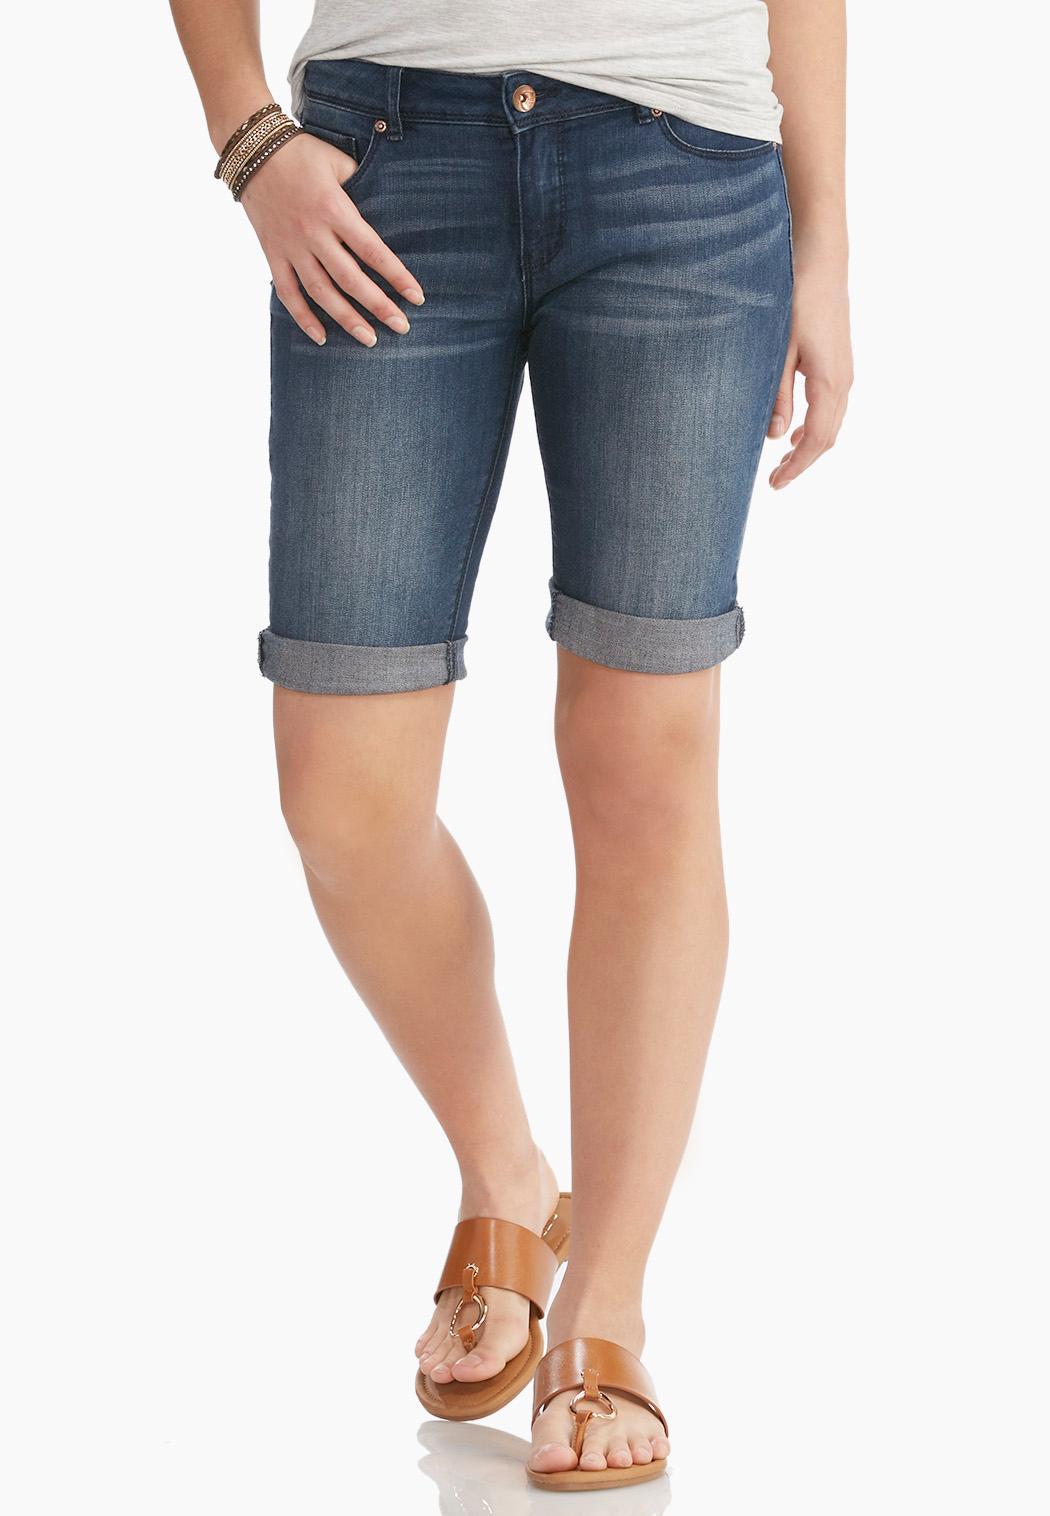 Cuffed Bermuda Jean Shorts Shorts & Crops Cato Fashions